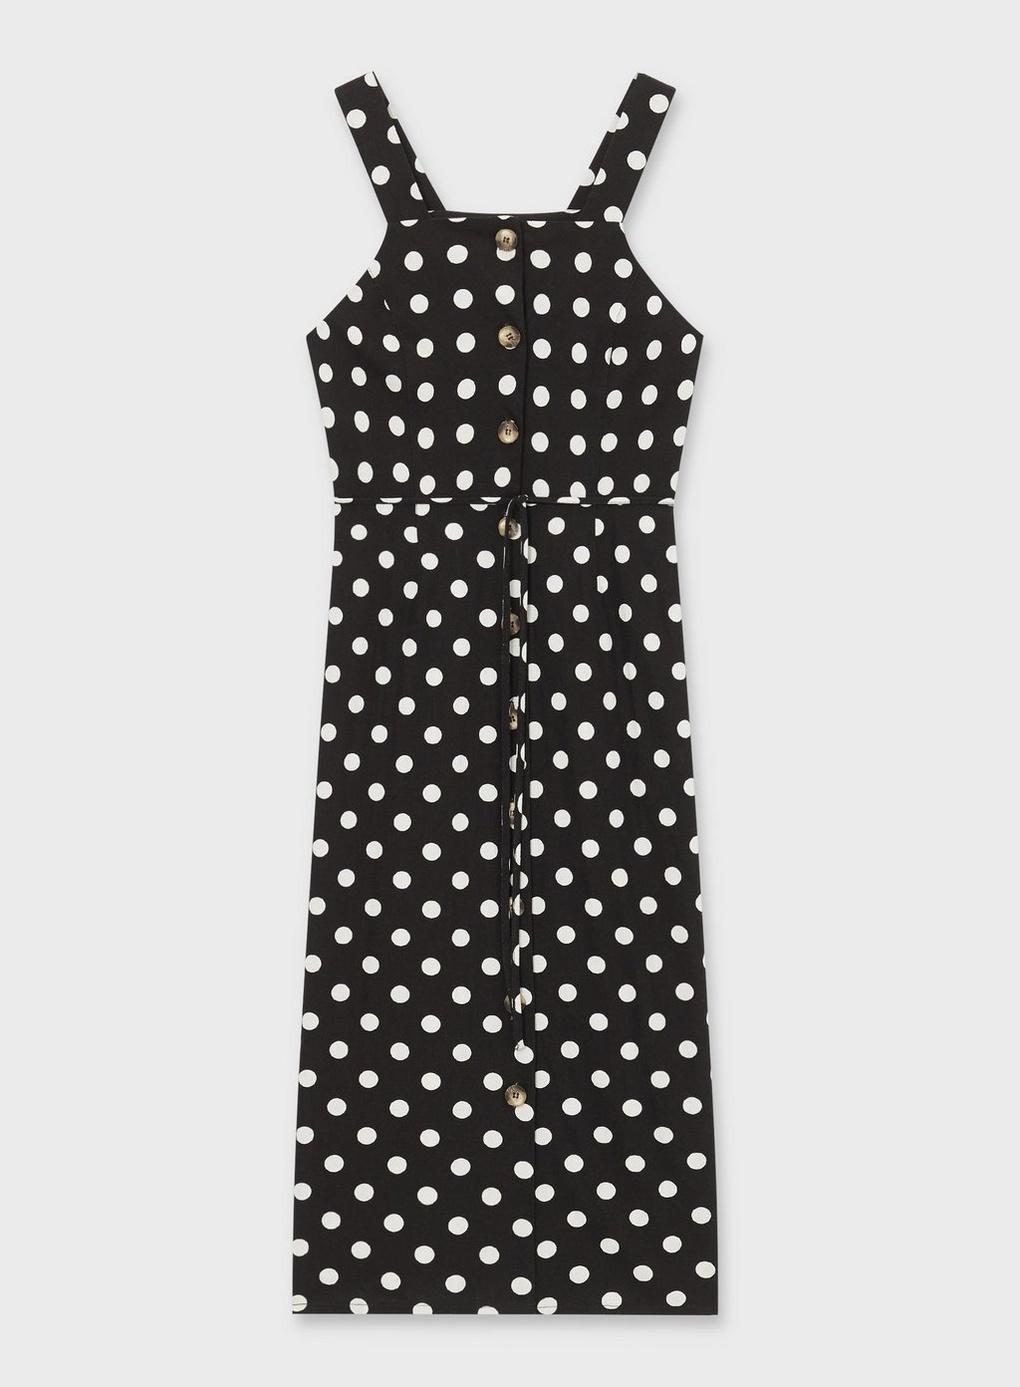 eefac4da5d Miss Selfridge Black Spot Print Pinafore Dress With Linen in Black ...